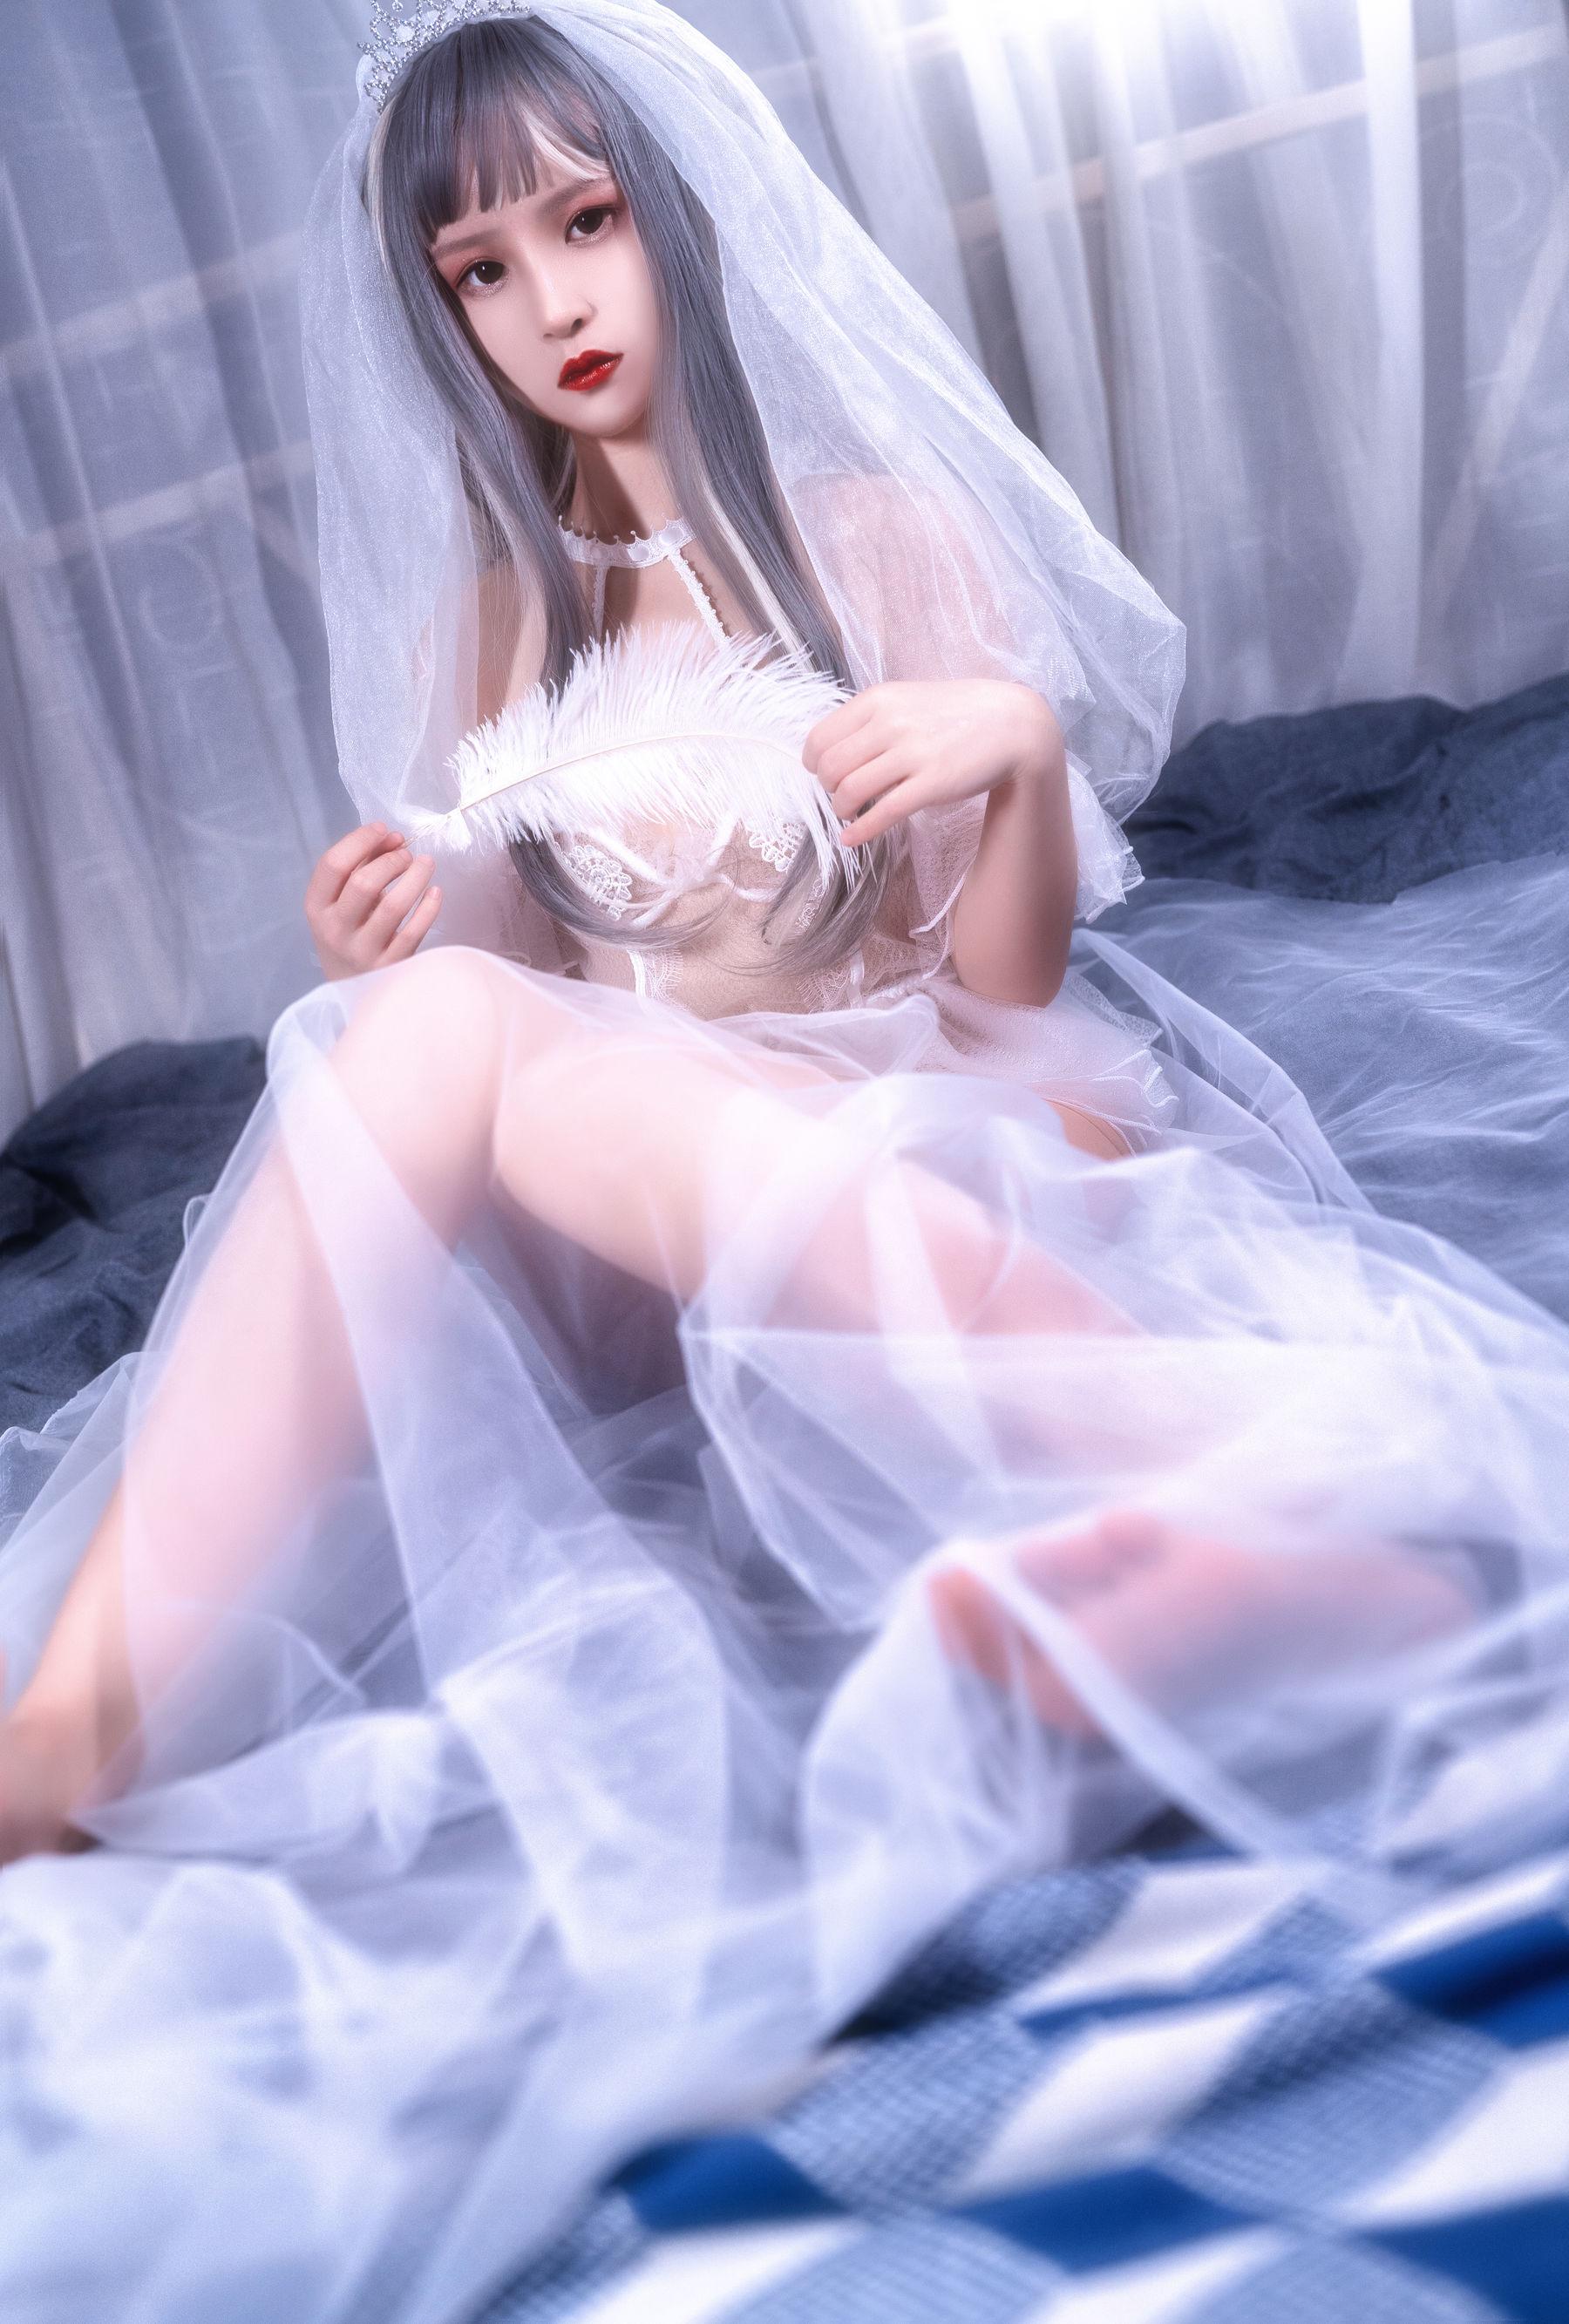 VOL.1441 [网络美女]福利婚纱透视美女:晕崽(晕崽Zz)超高清写真套图(19P)